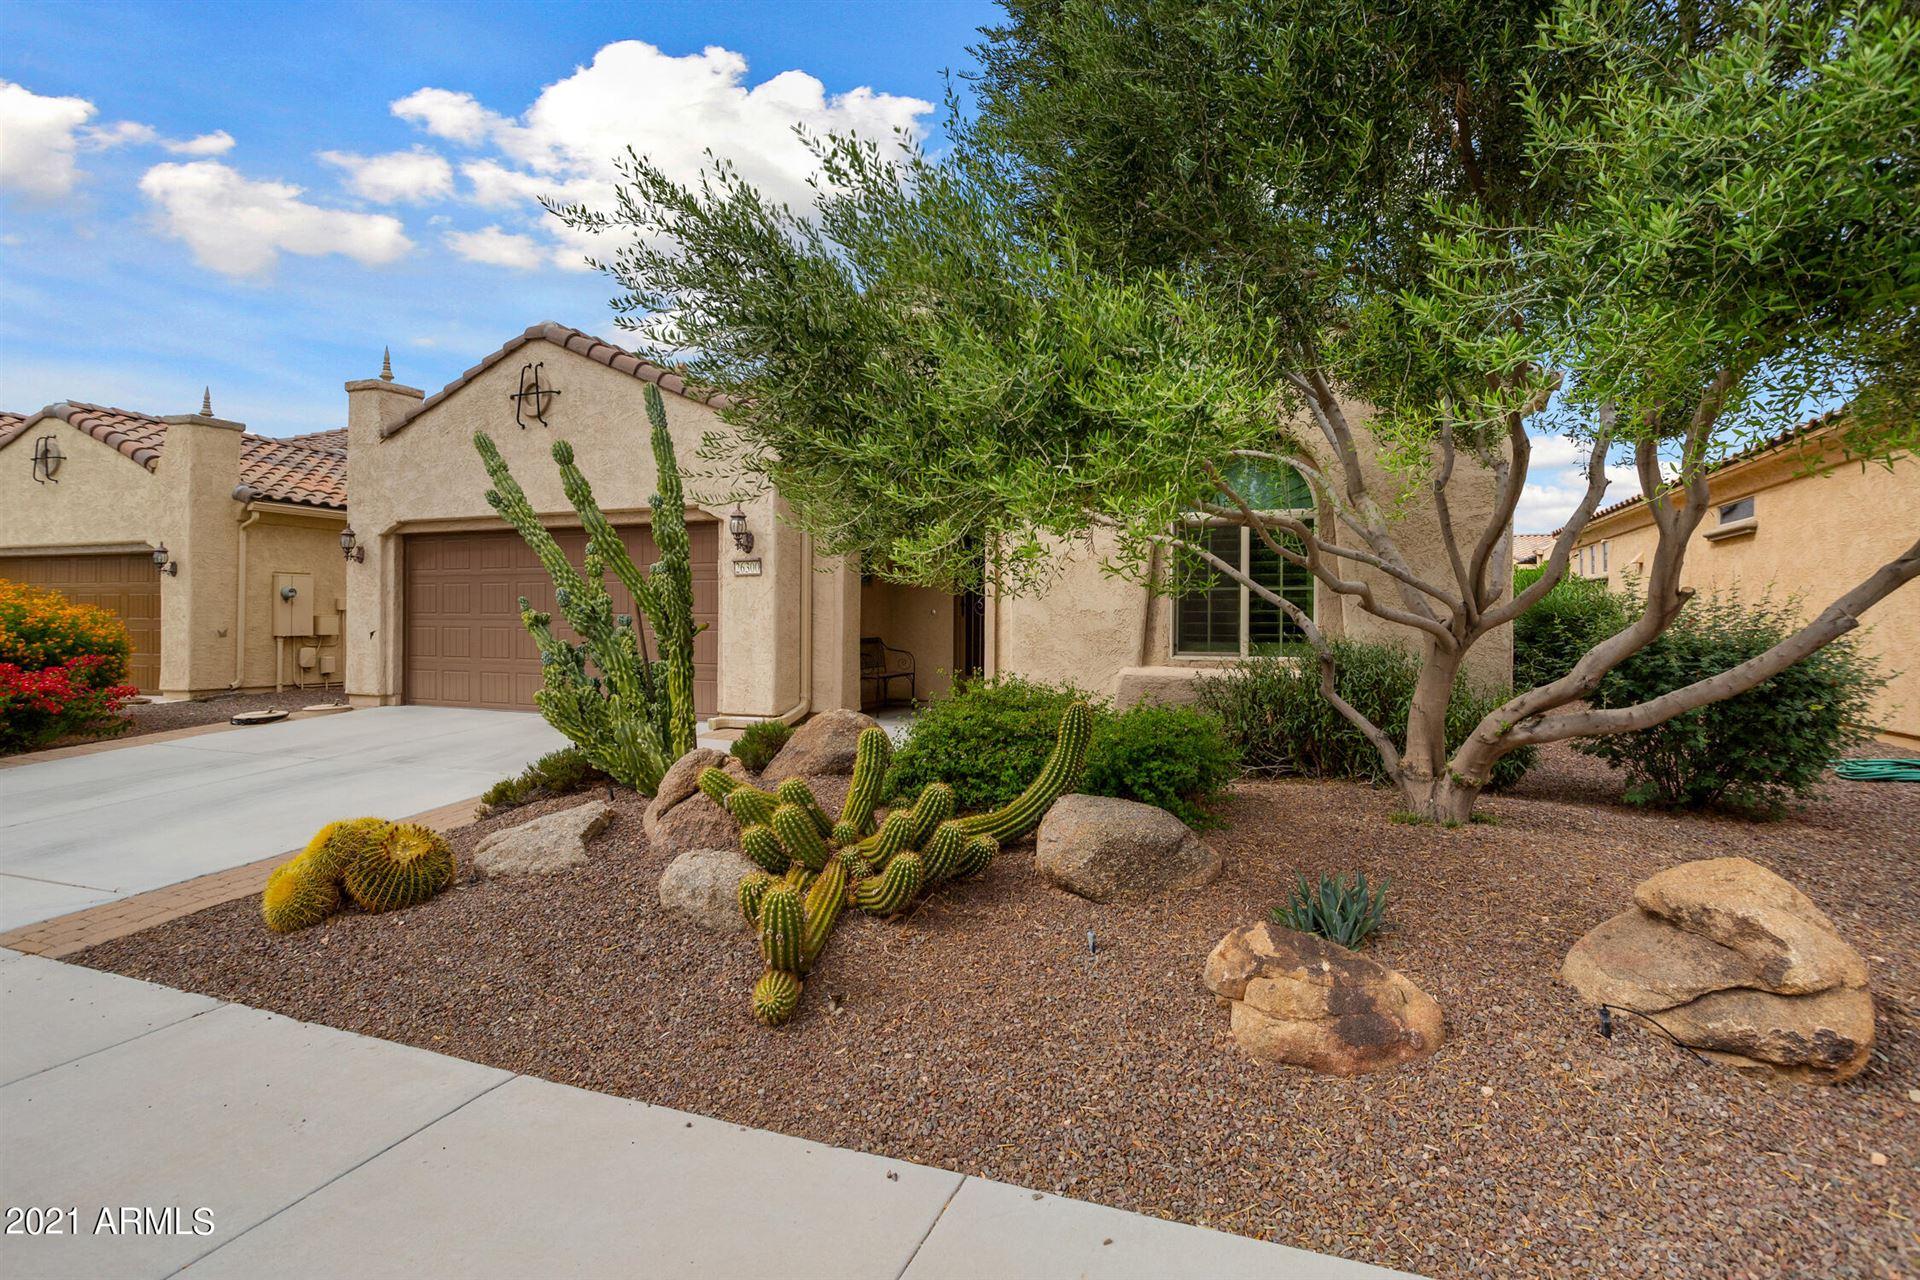 Photo of 26300 W FIREHAWK Drive, Buckeye, AZ 85396 (MLS # 6295640)